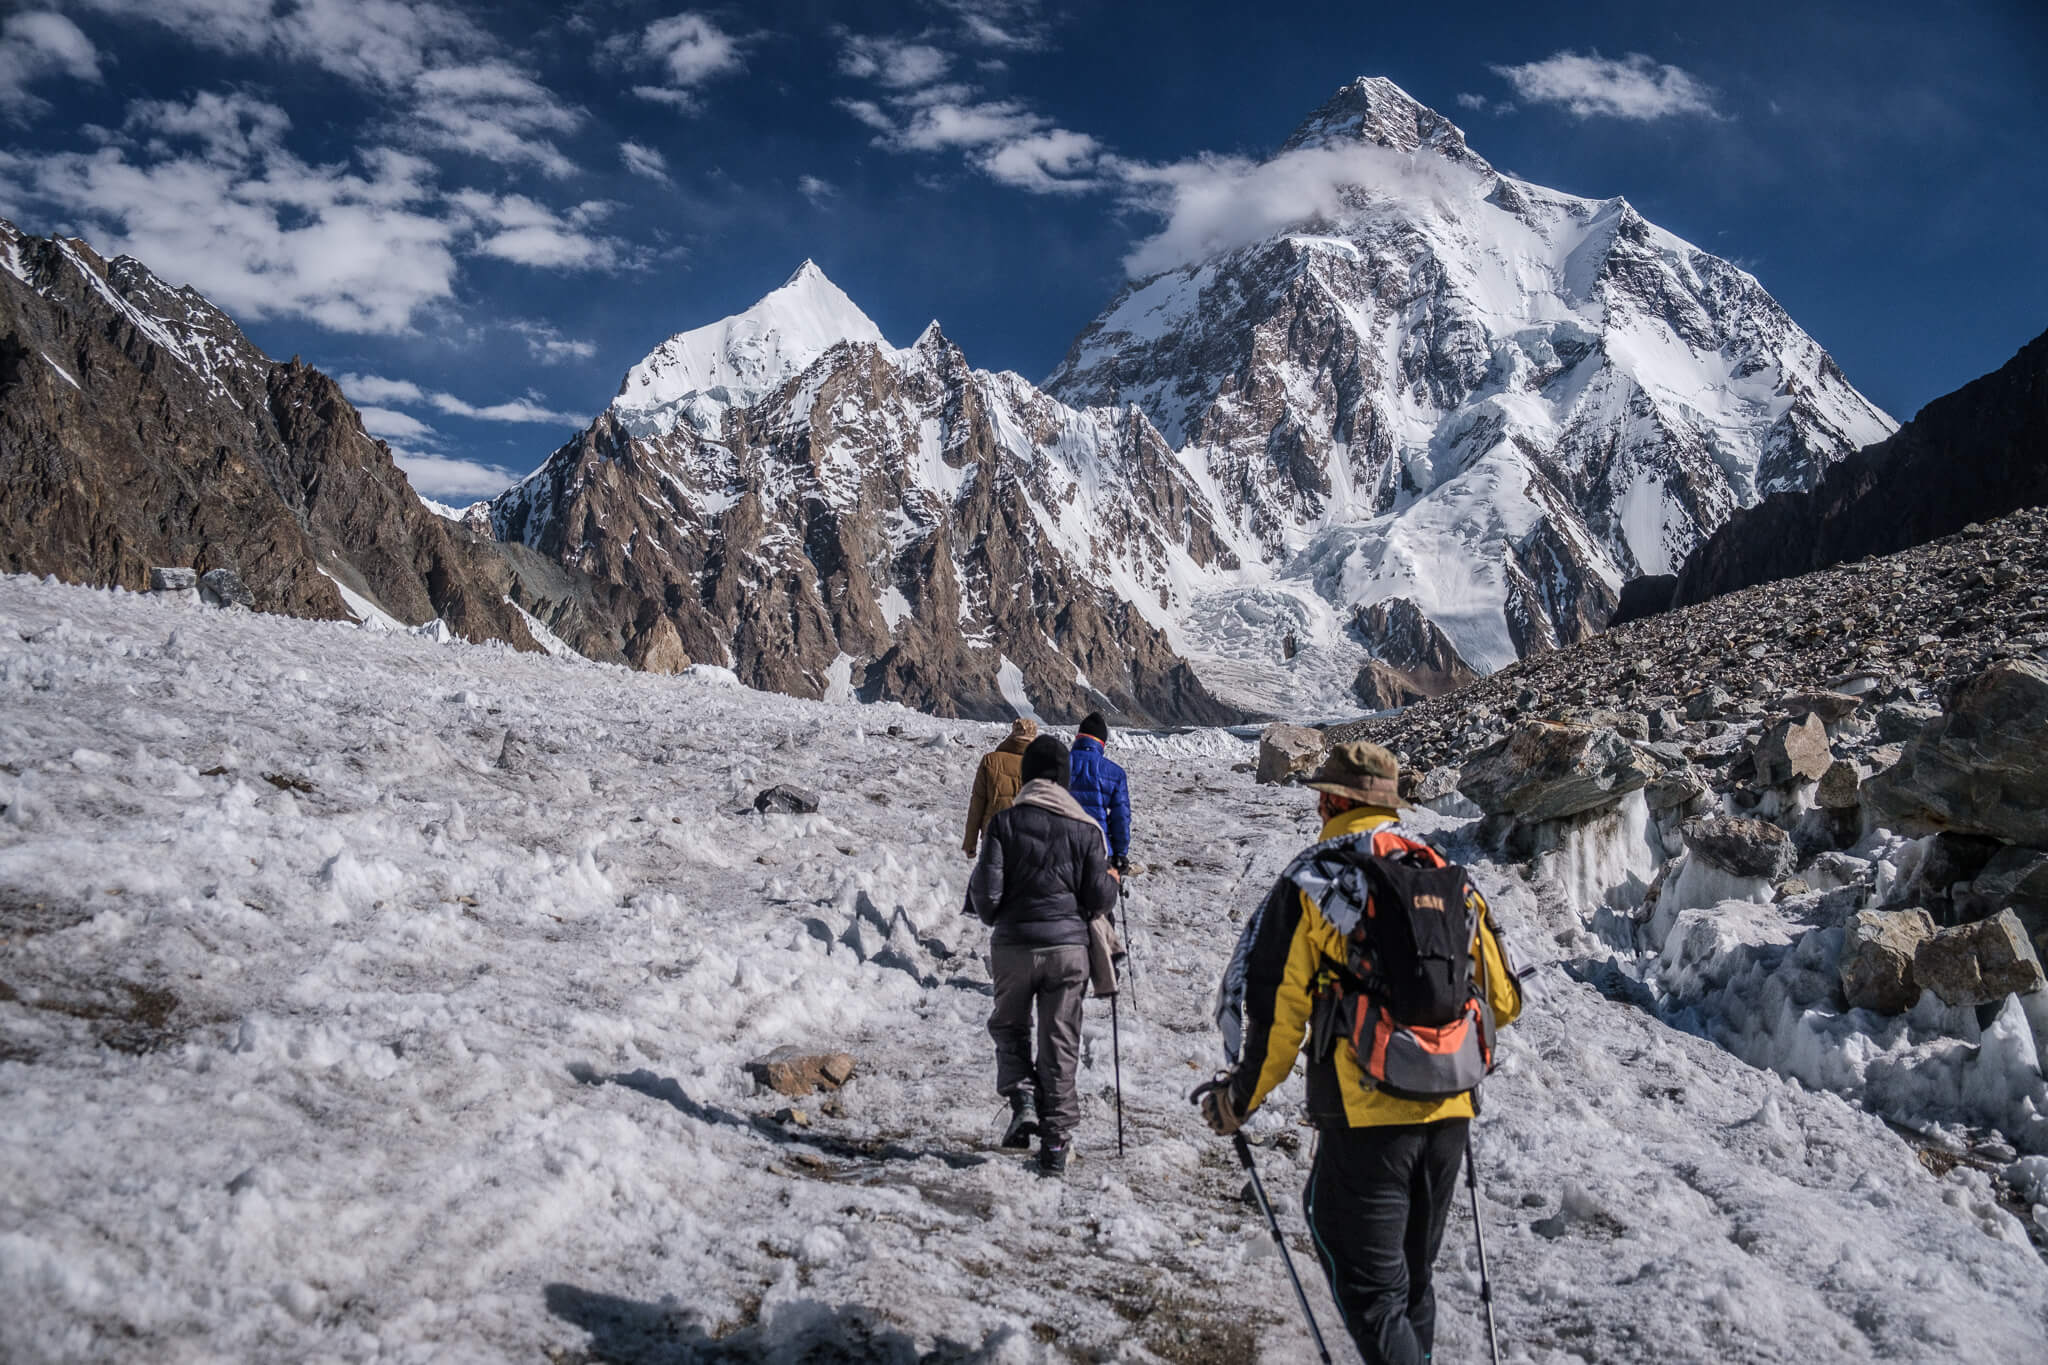 trekkers doing the k2 trek amongst the mountains of northern pakistan